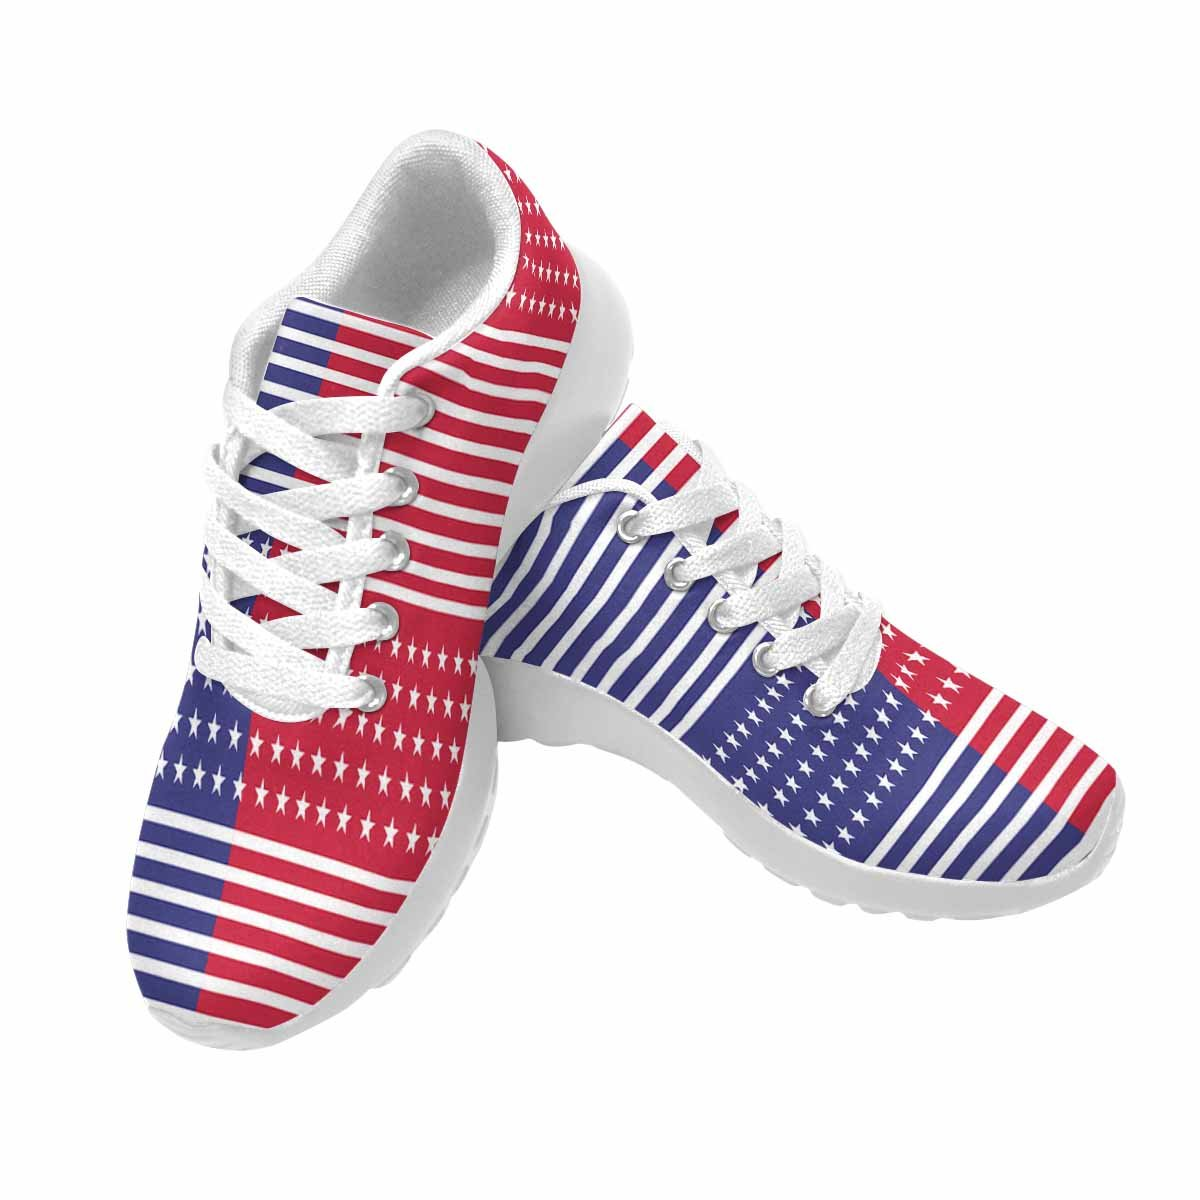 GordonKo Fashion Sneaker Unisex Lightweight Comfortable Walking Athletic Shoes for Kids